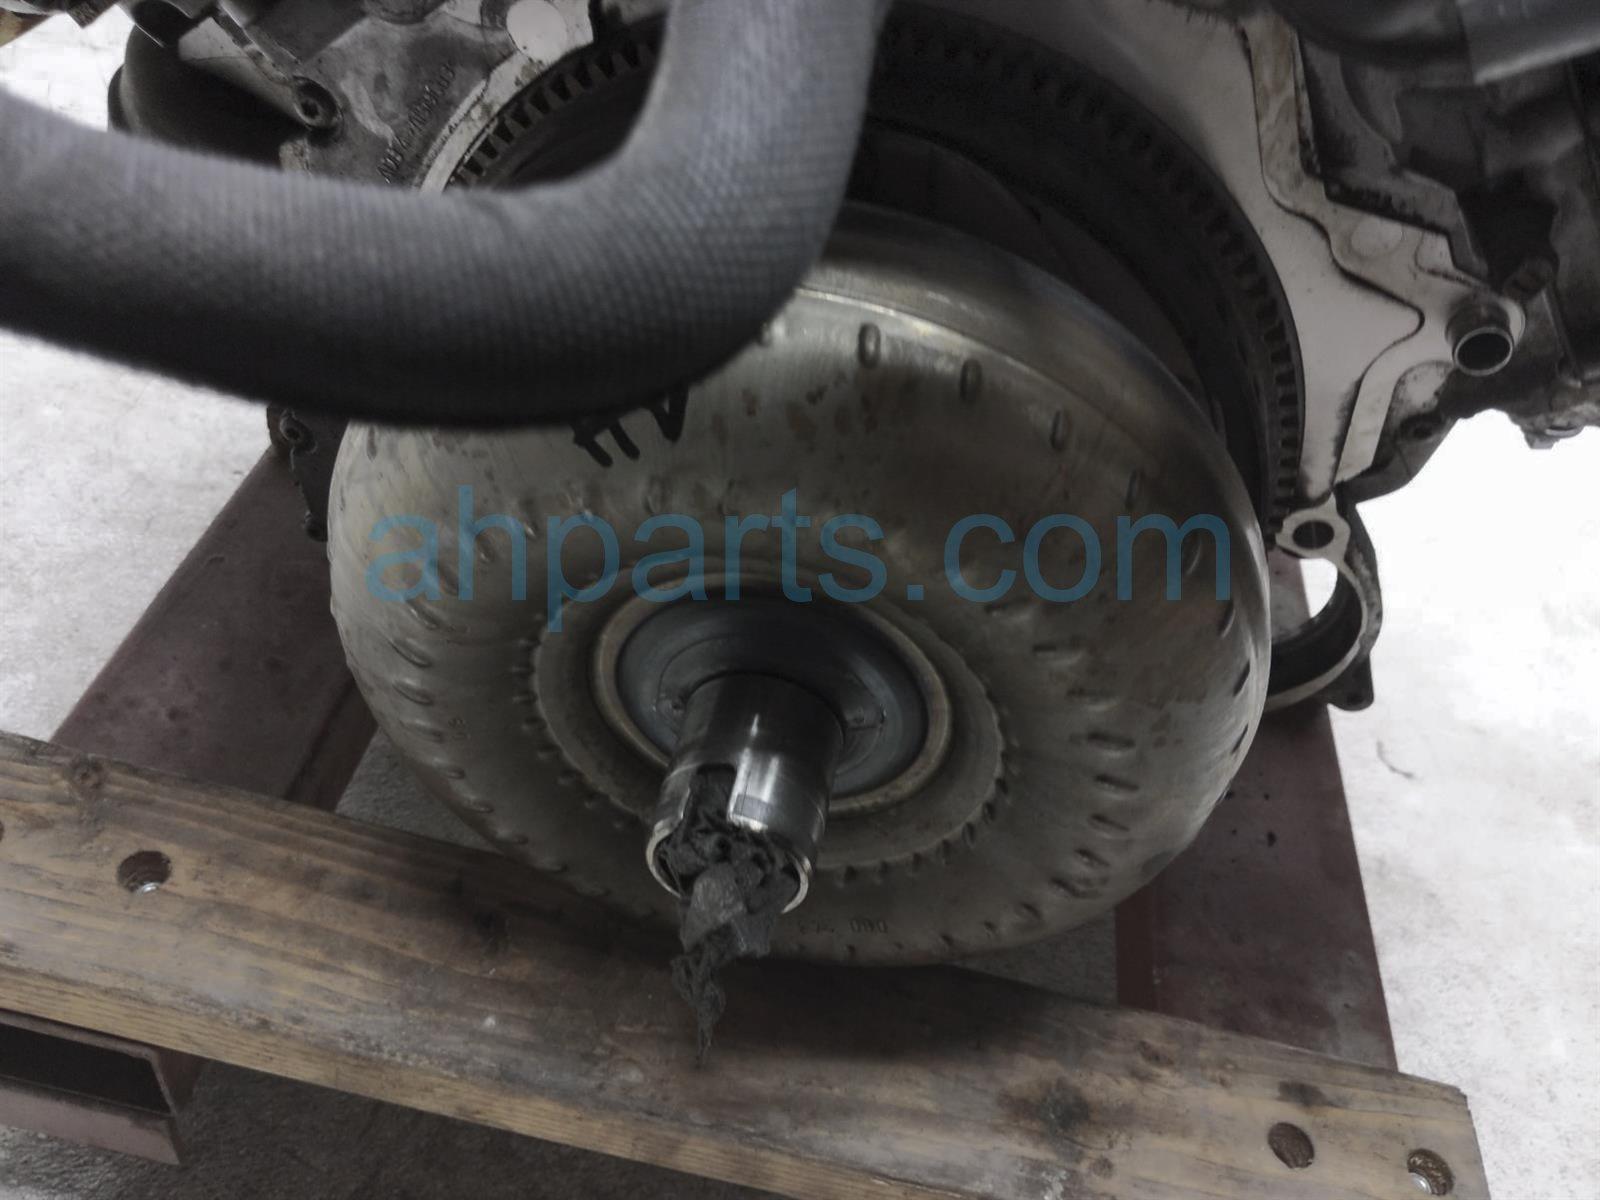 2011 Audi A6 Audi Motor / Engine = 180k Miles 06E 100 032 X Replacement